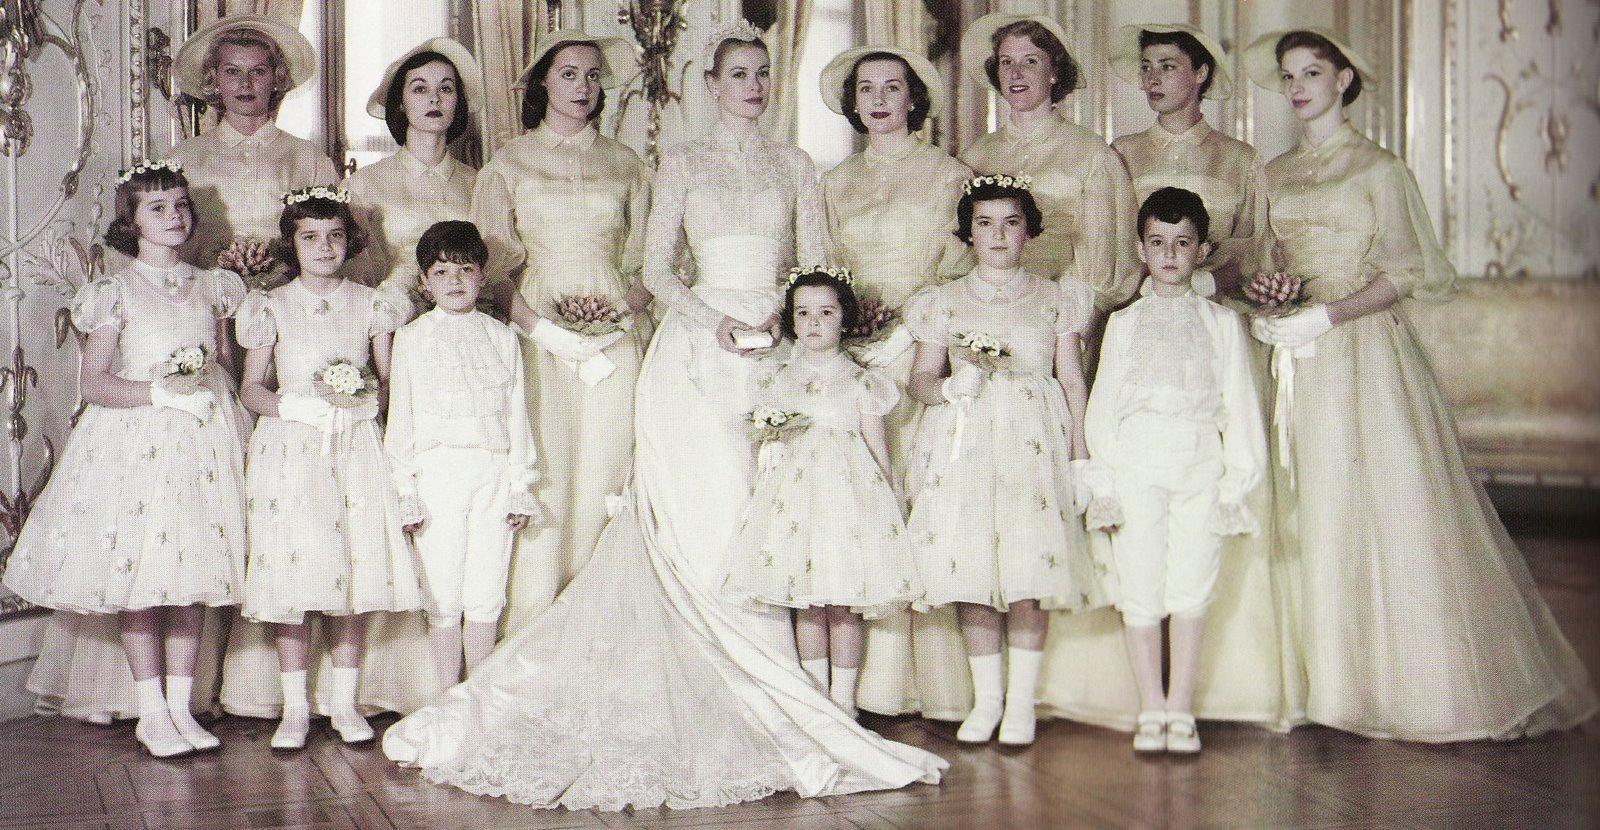 http://2.bp.blogspot.com/-uDkV8Wchnro/Ta29UbKk20I/AAAAAAAAc7s/1_sSdJZN0D4/s1600/4.+grace-kelly-bridal-party.jpg